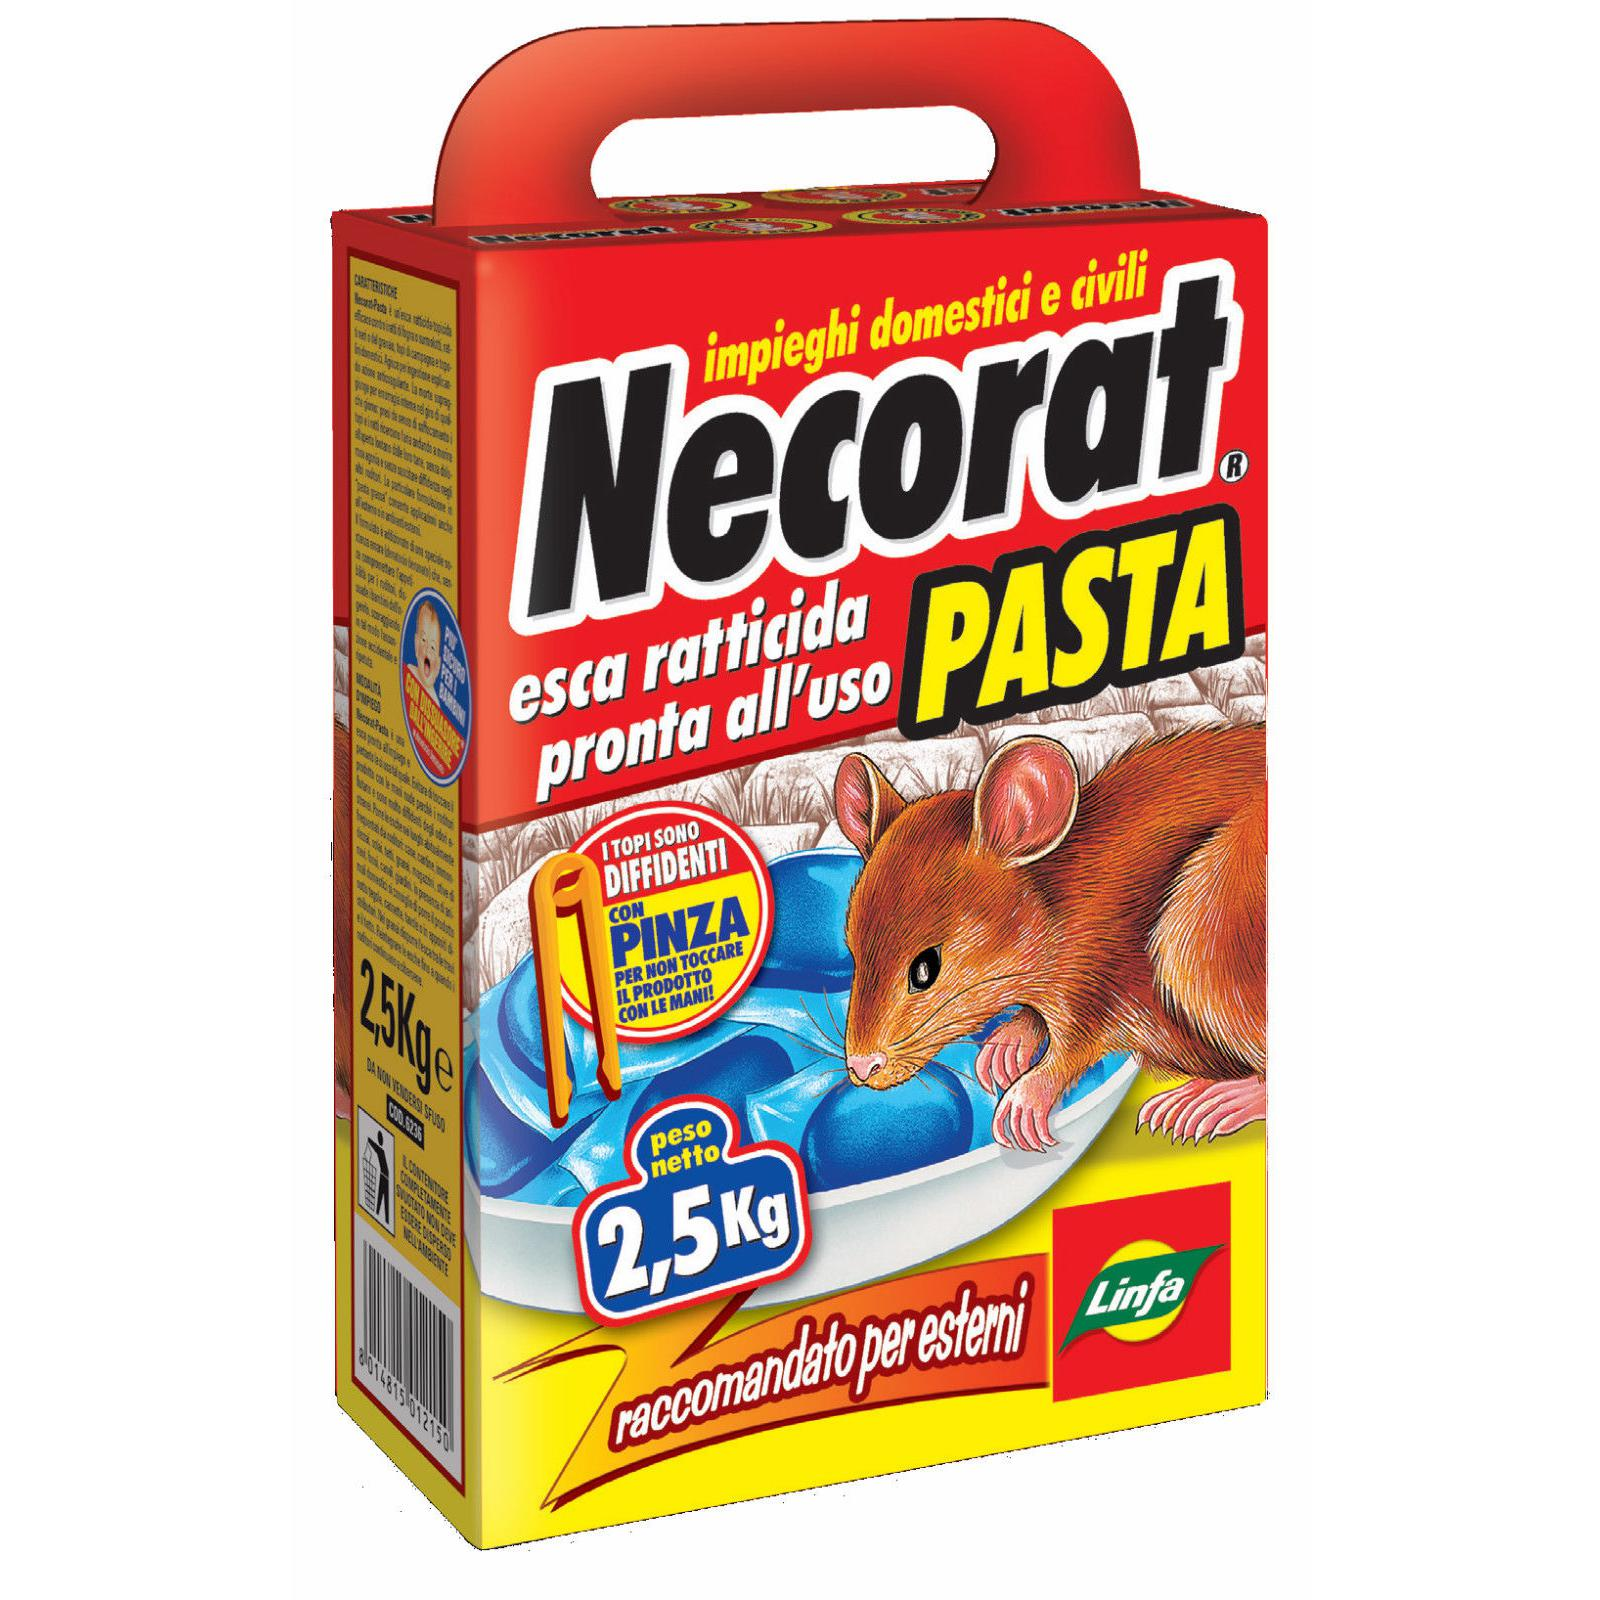 LINFA ESCA PASTA VELENO TOPI TOPICIDA RATTICIDA 2,5 kg PRONTO USO Mod. NECORAT